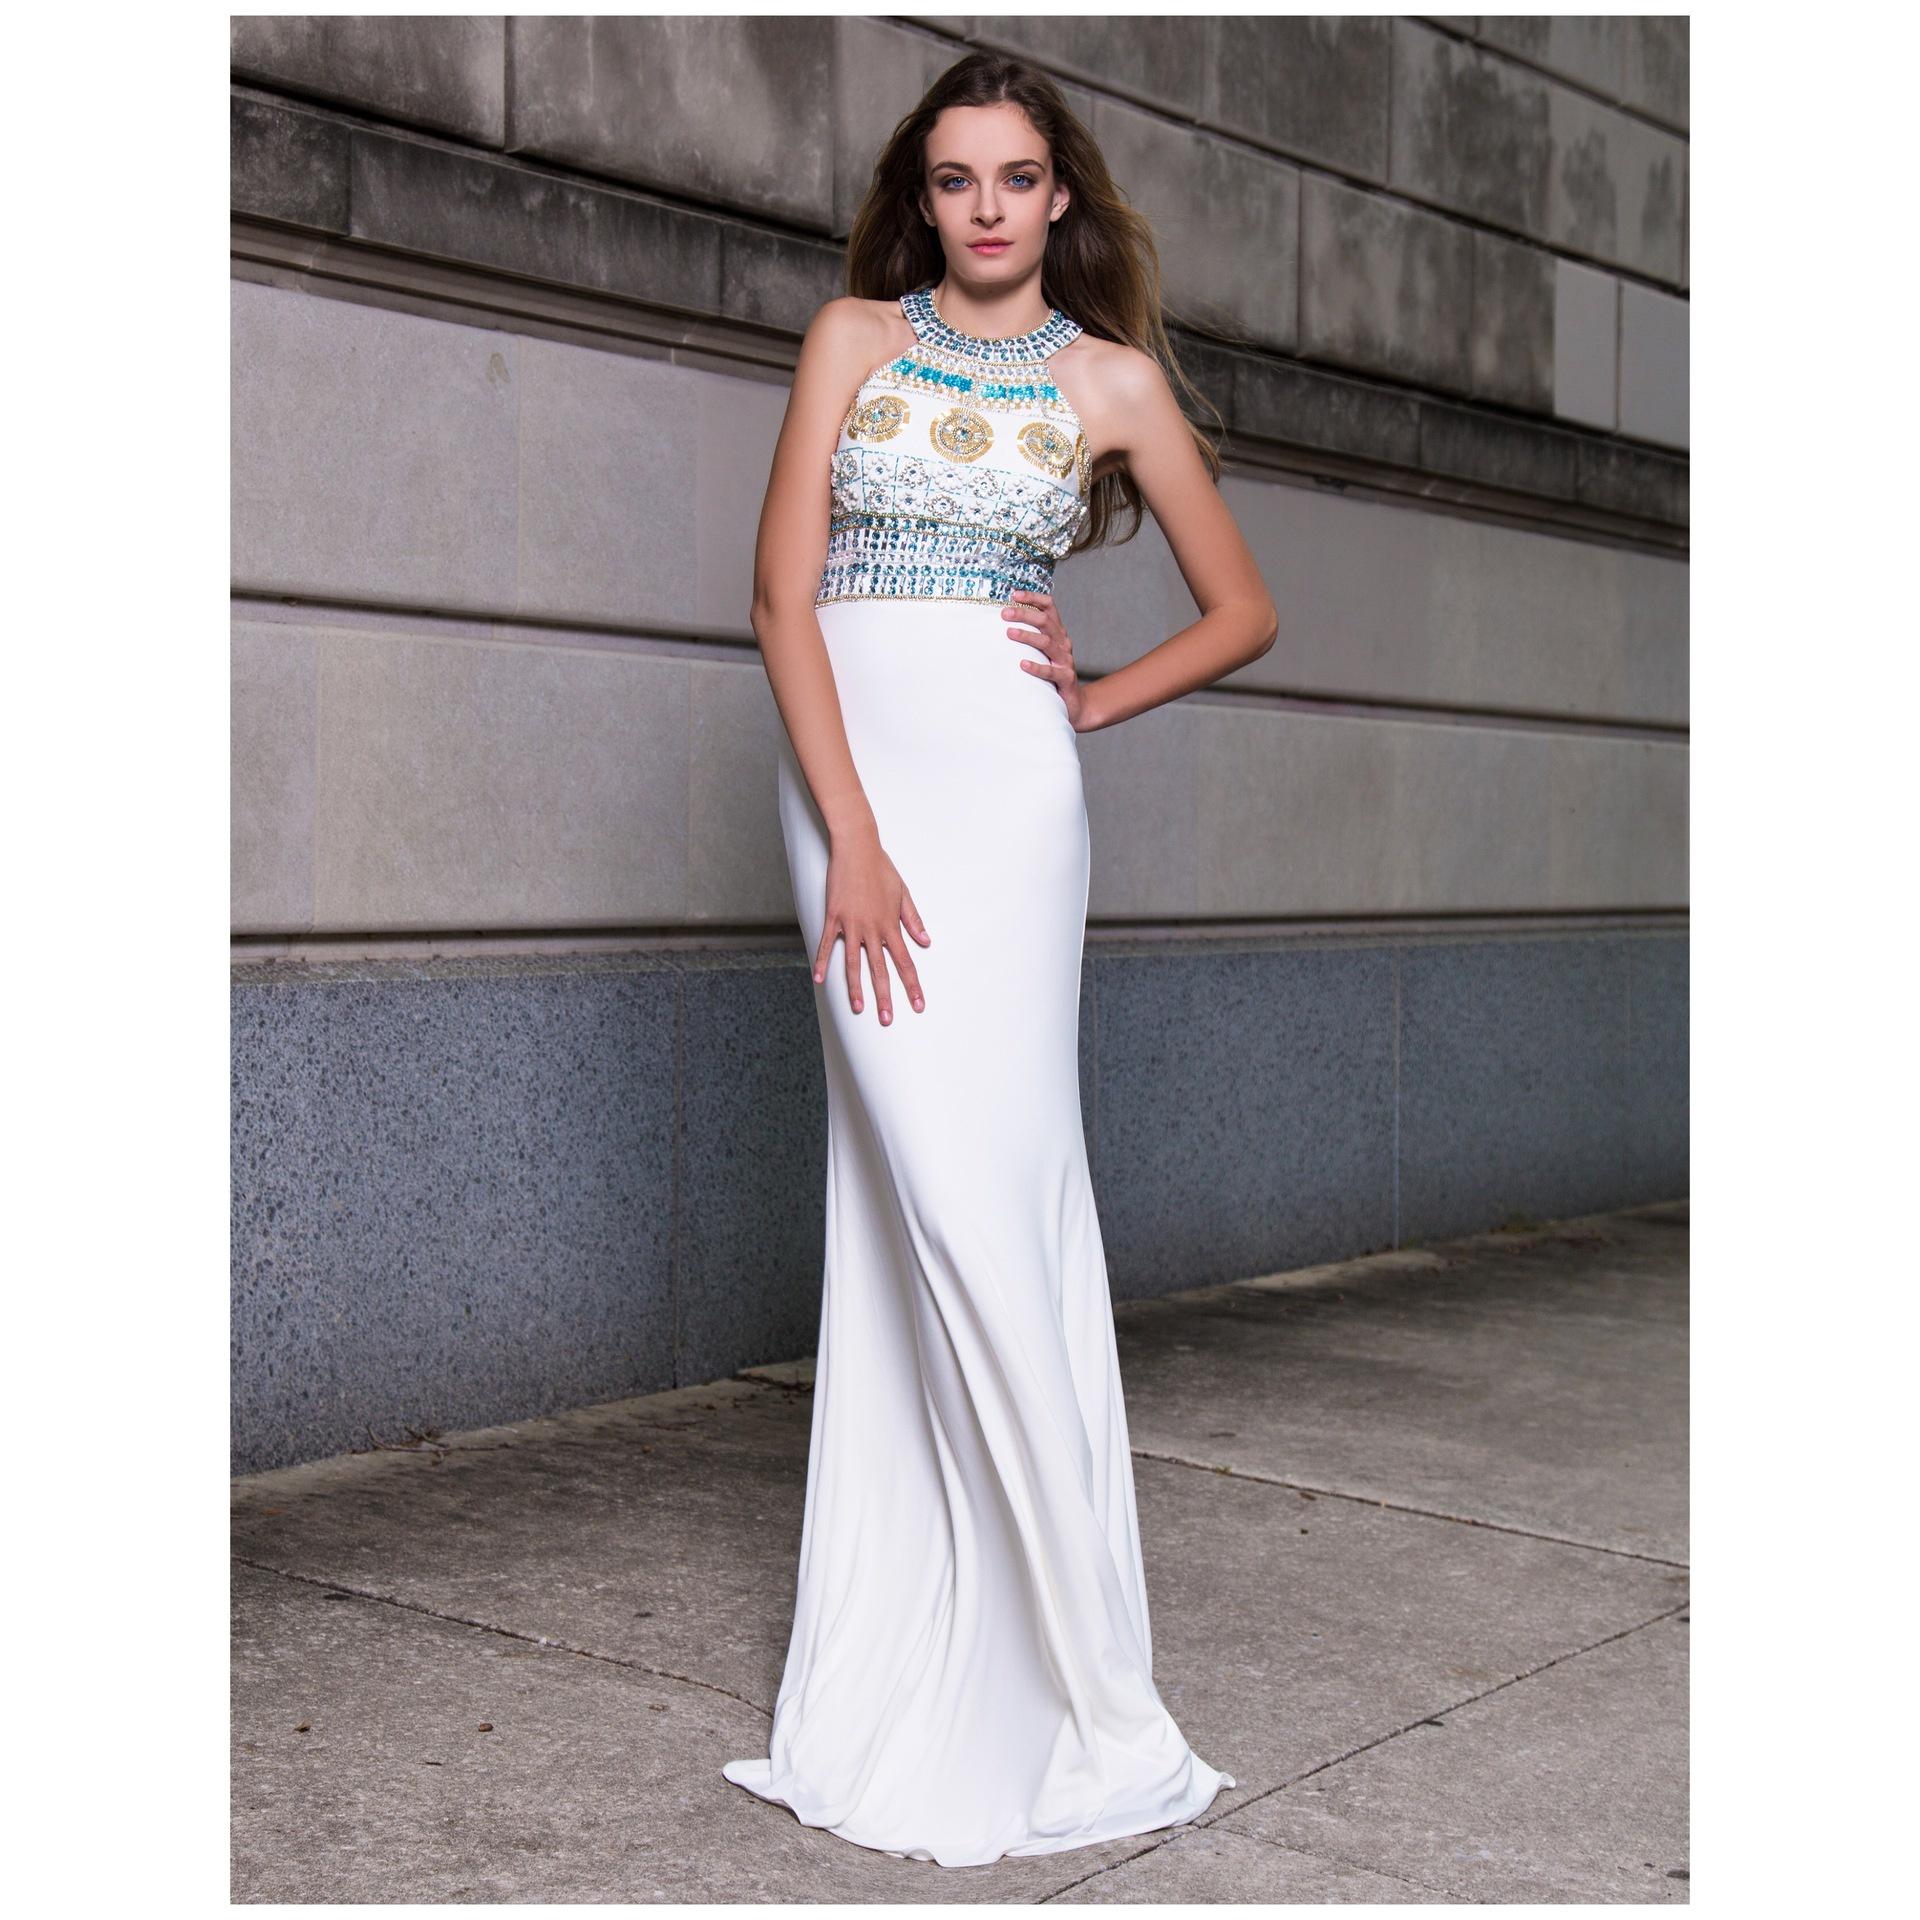 Cream hand beaded floor length dress